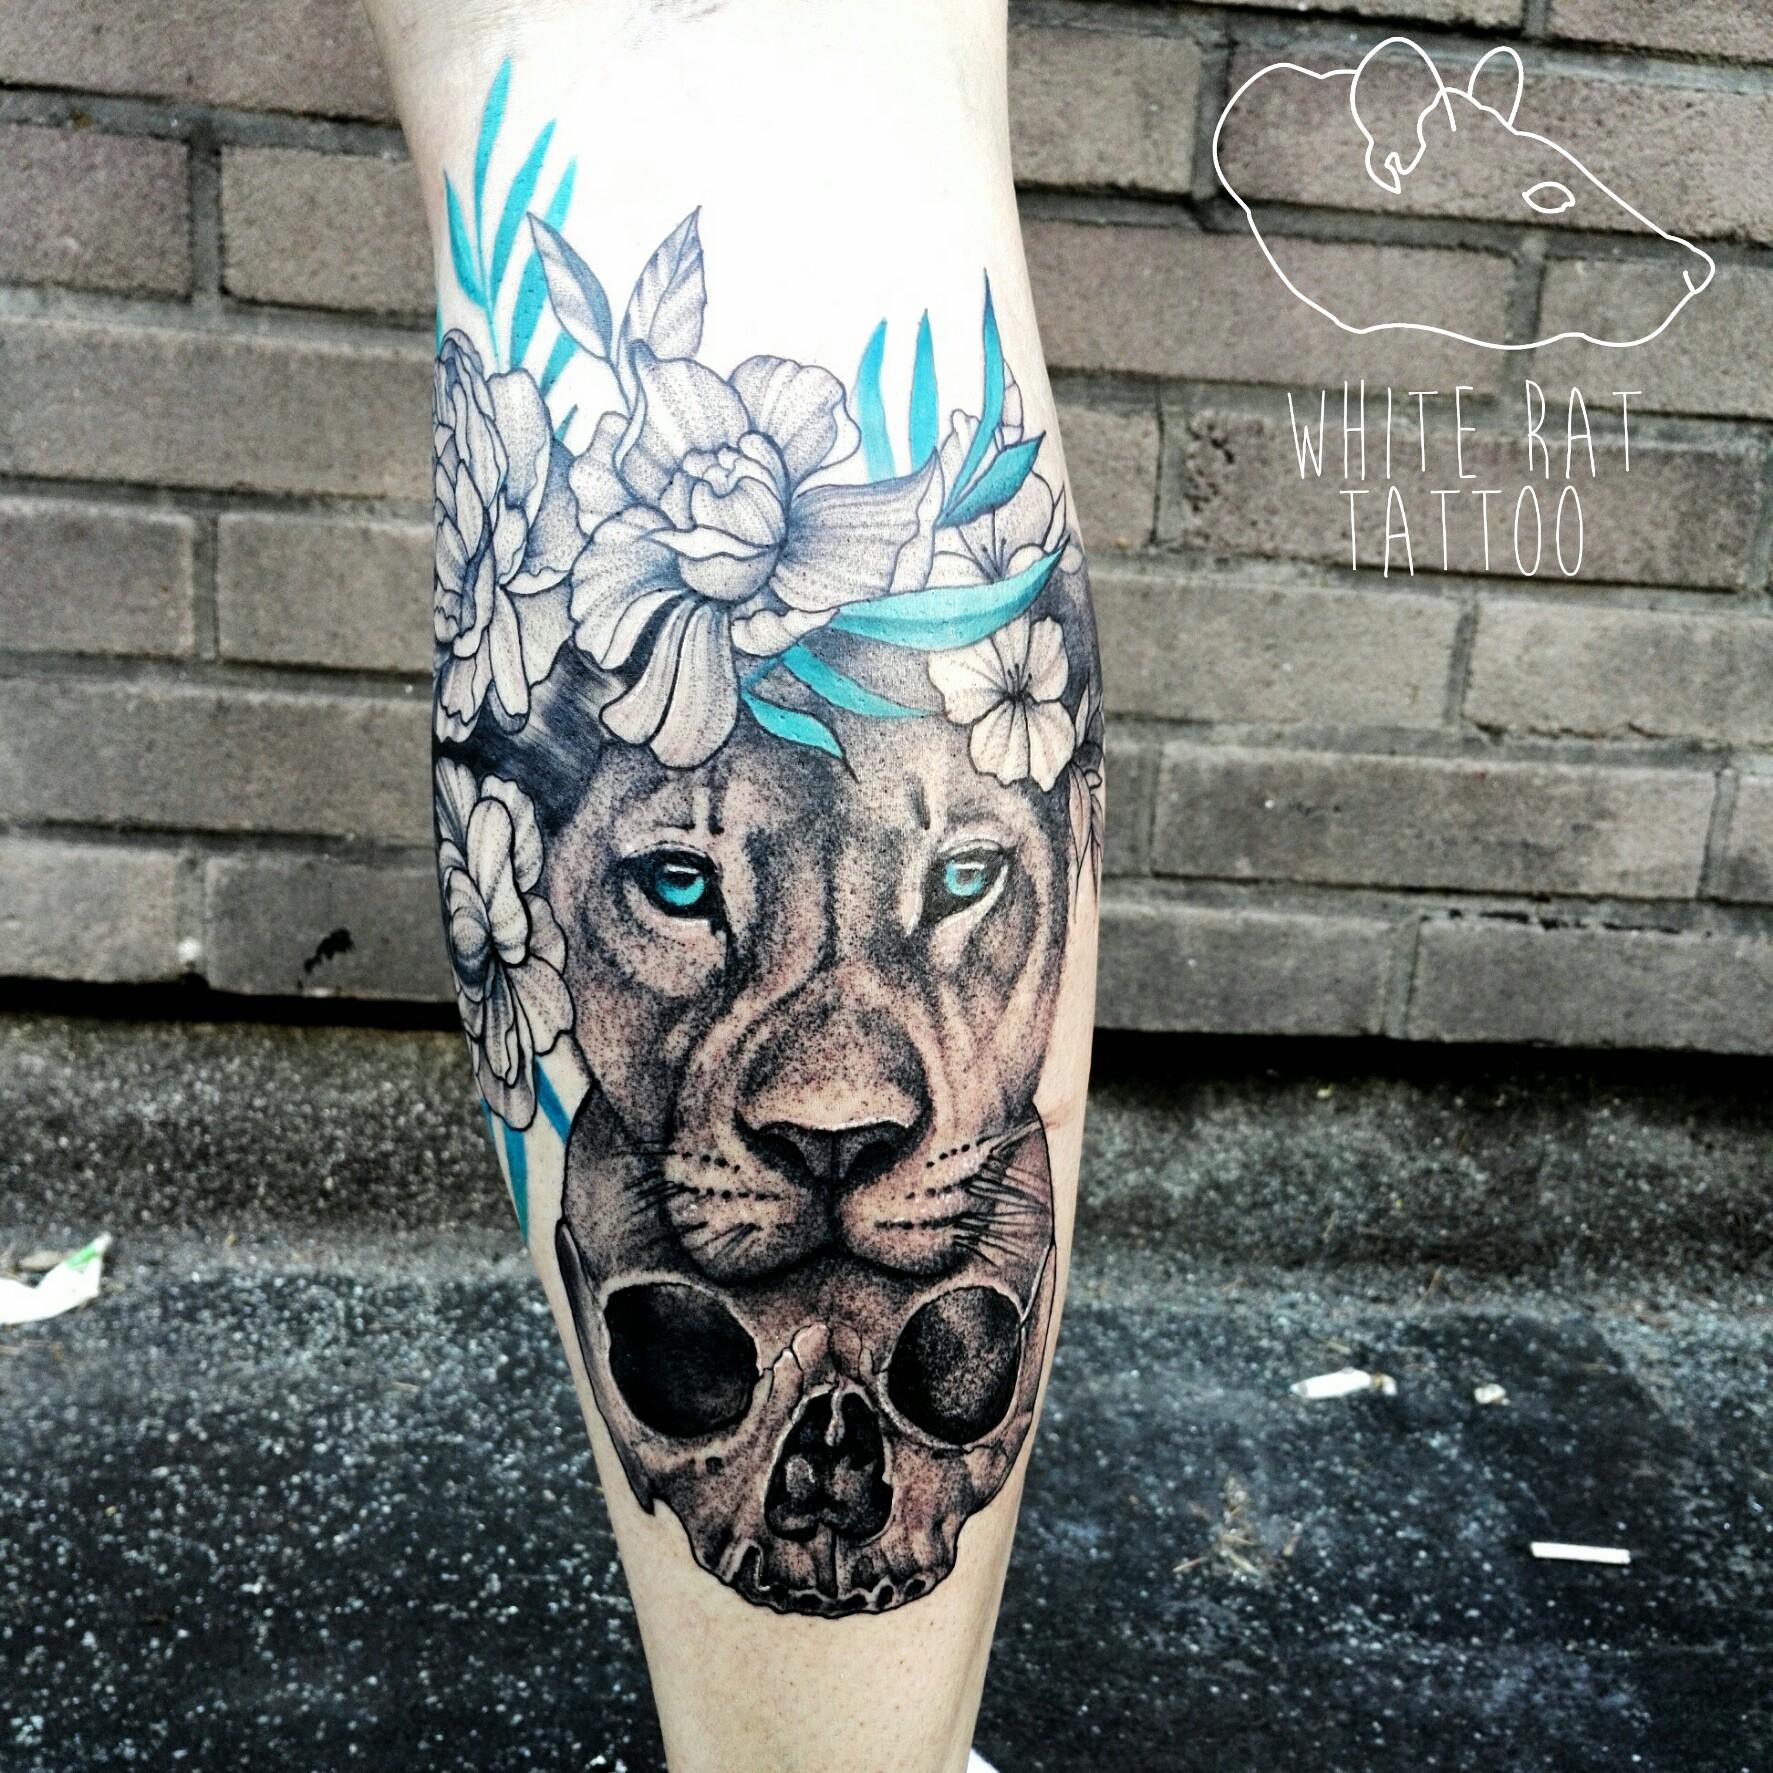 Studio Tatuażu White Rat Tattoo Agata Kacperczyk